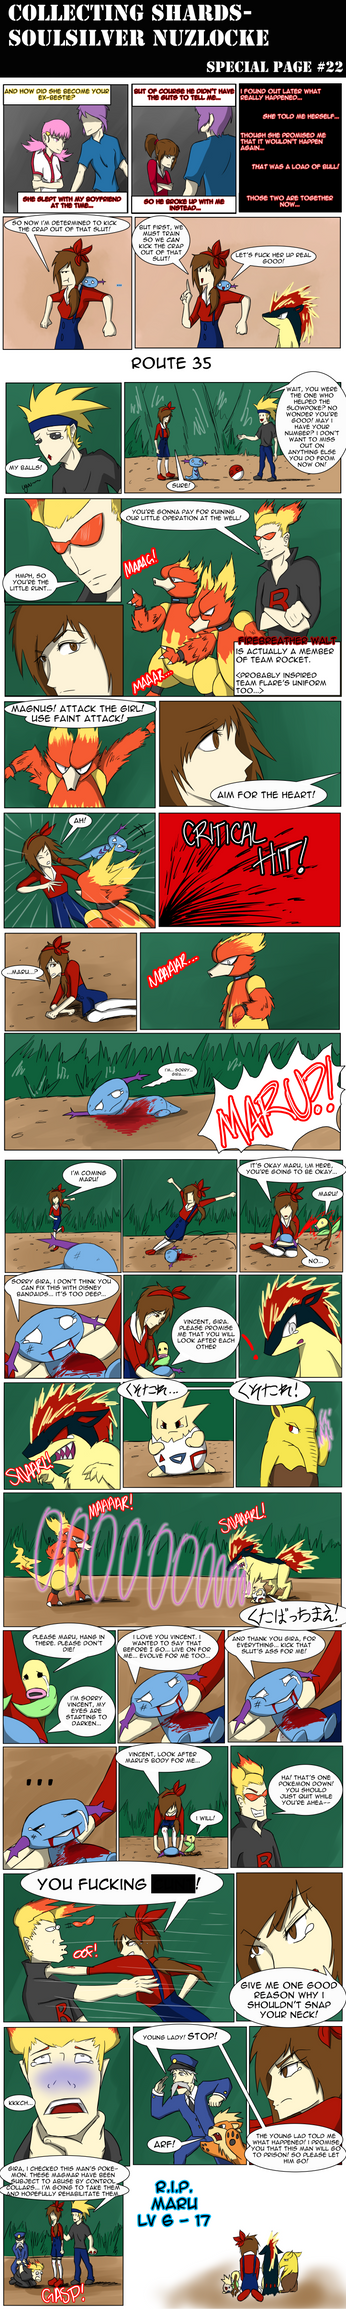 SPECIAL SoulSilver Nuzlocke Page 22 by LittleScarecrow